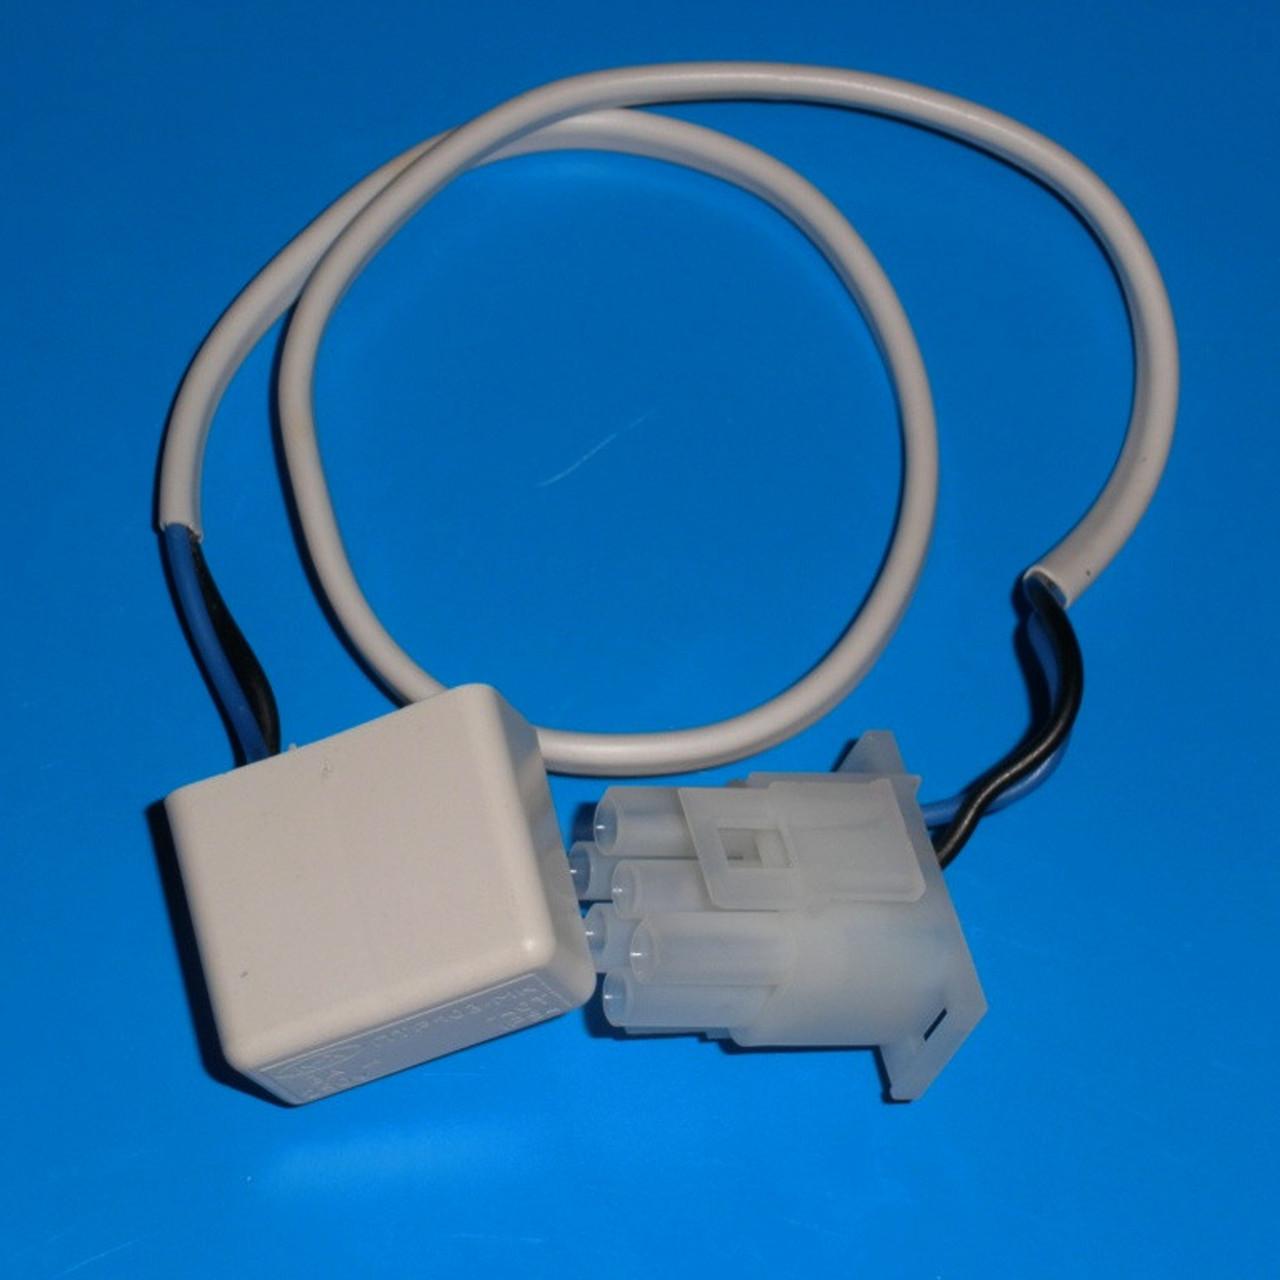 Датчик температуры для холодильника Indesit, Ariston, Stinol NO FROST ПТР-103